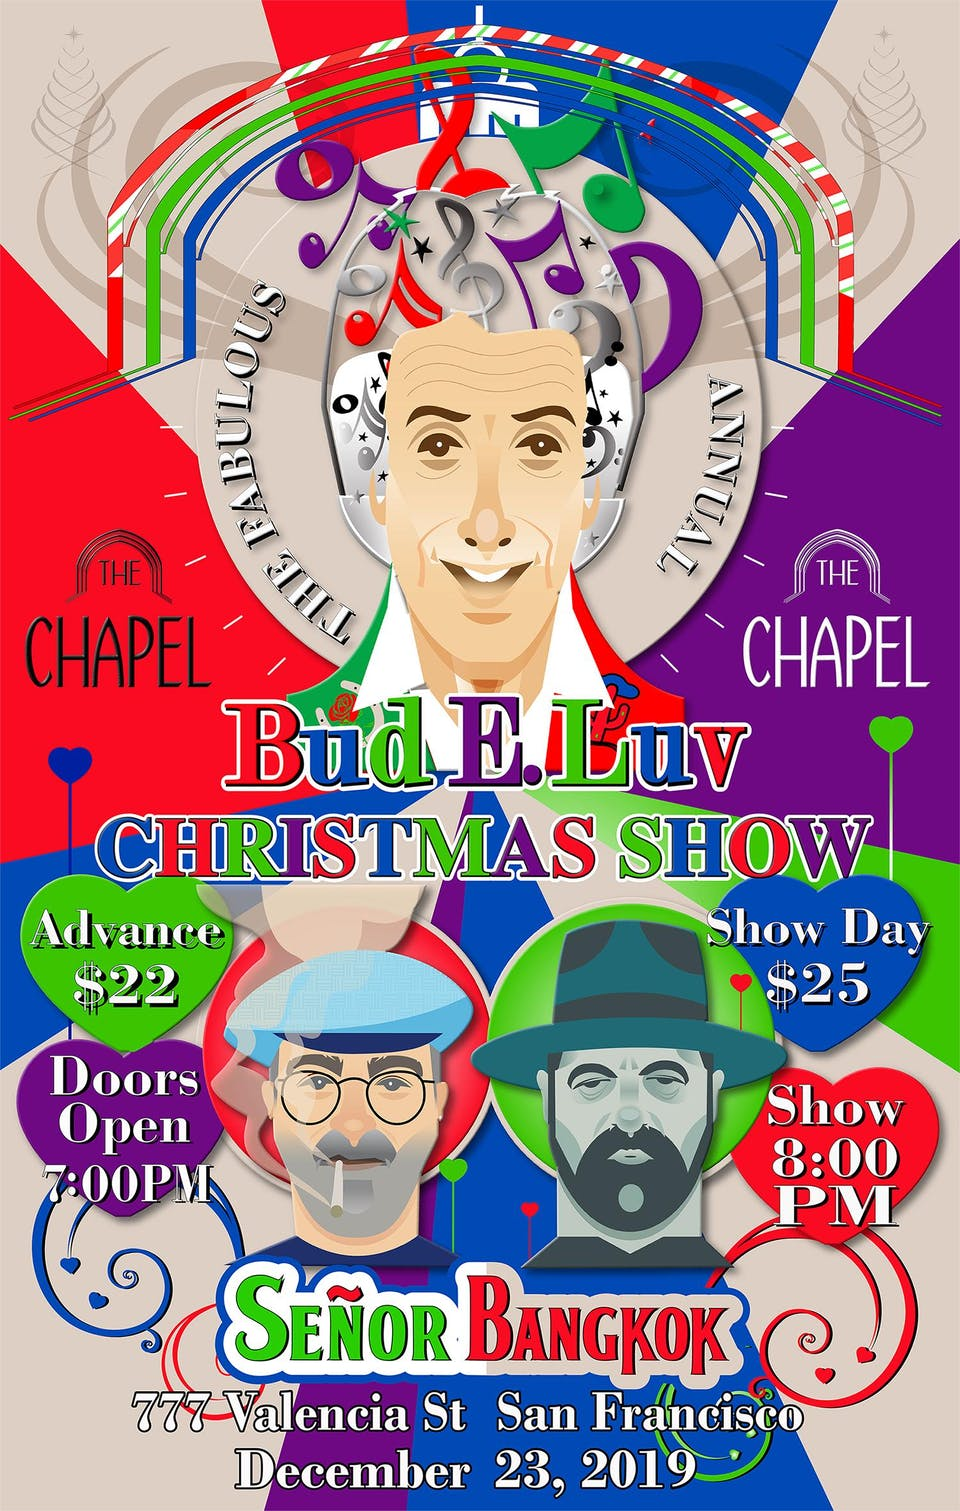 The Fabulous Bud E. Luv Christmas Spectacular